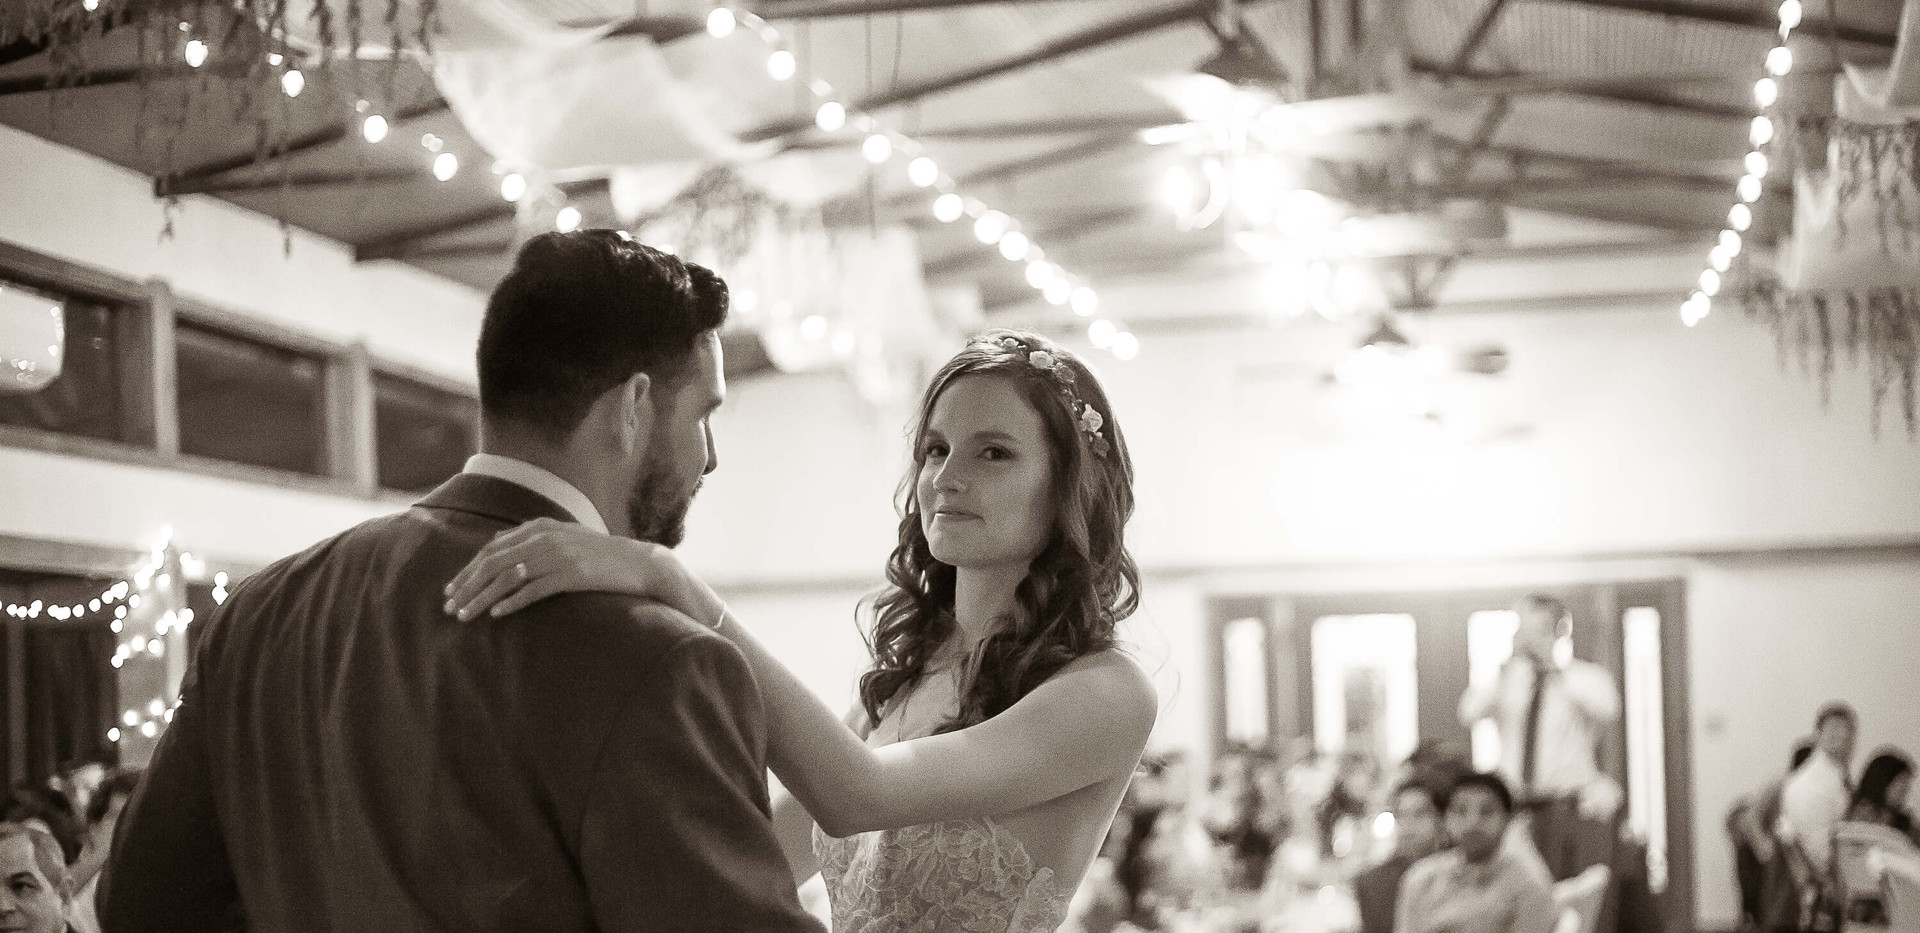 Wimberley Wedding Venue- First Dance in